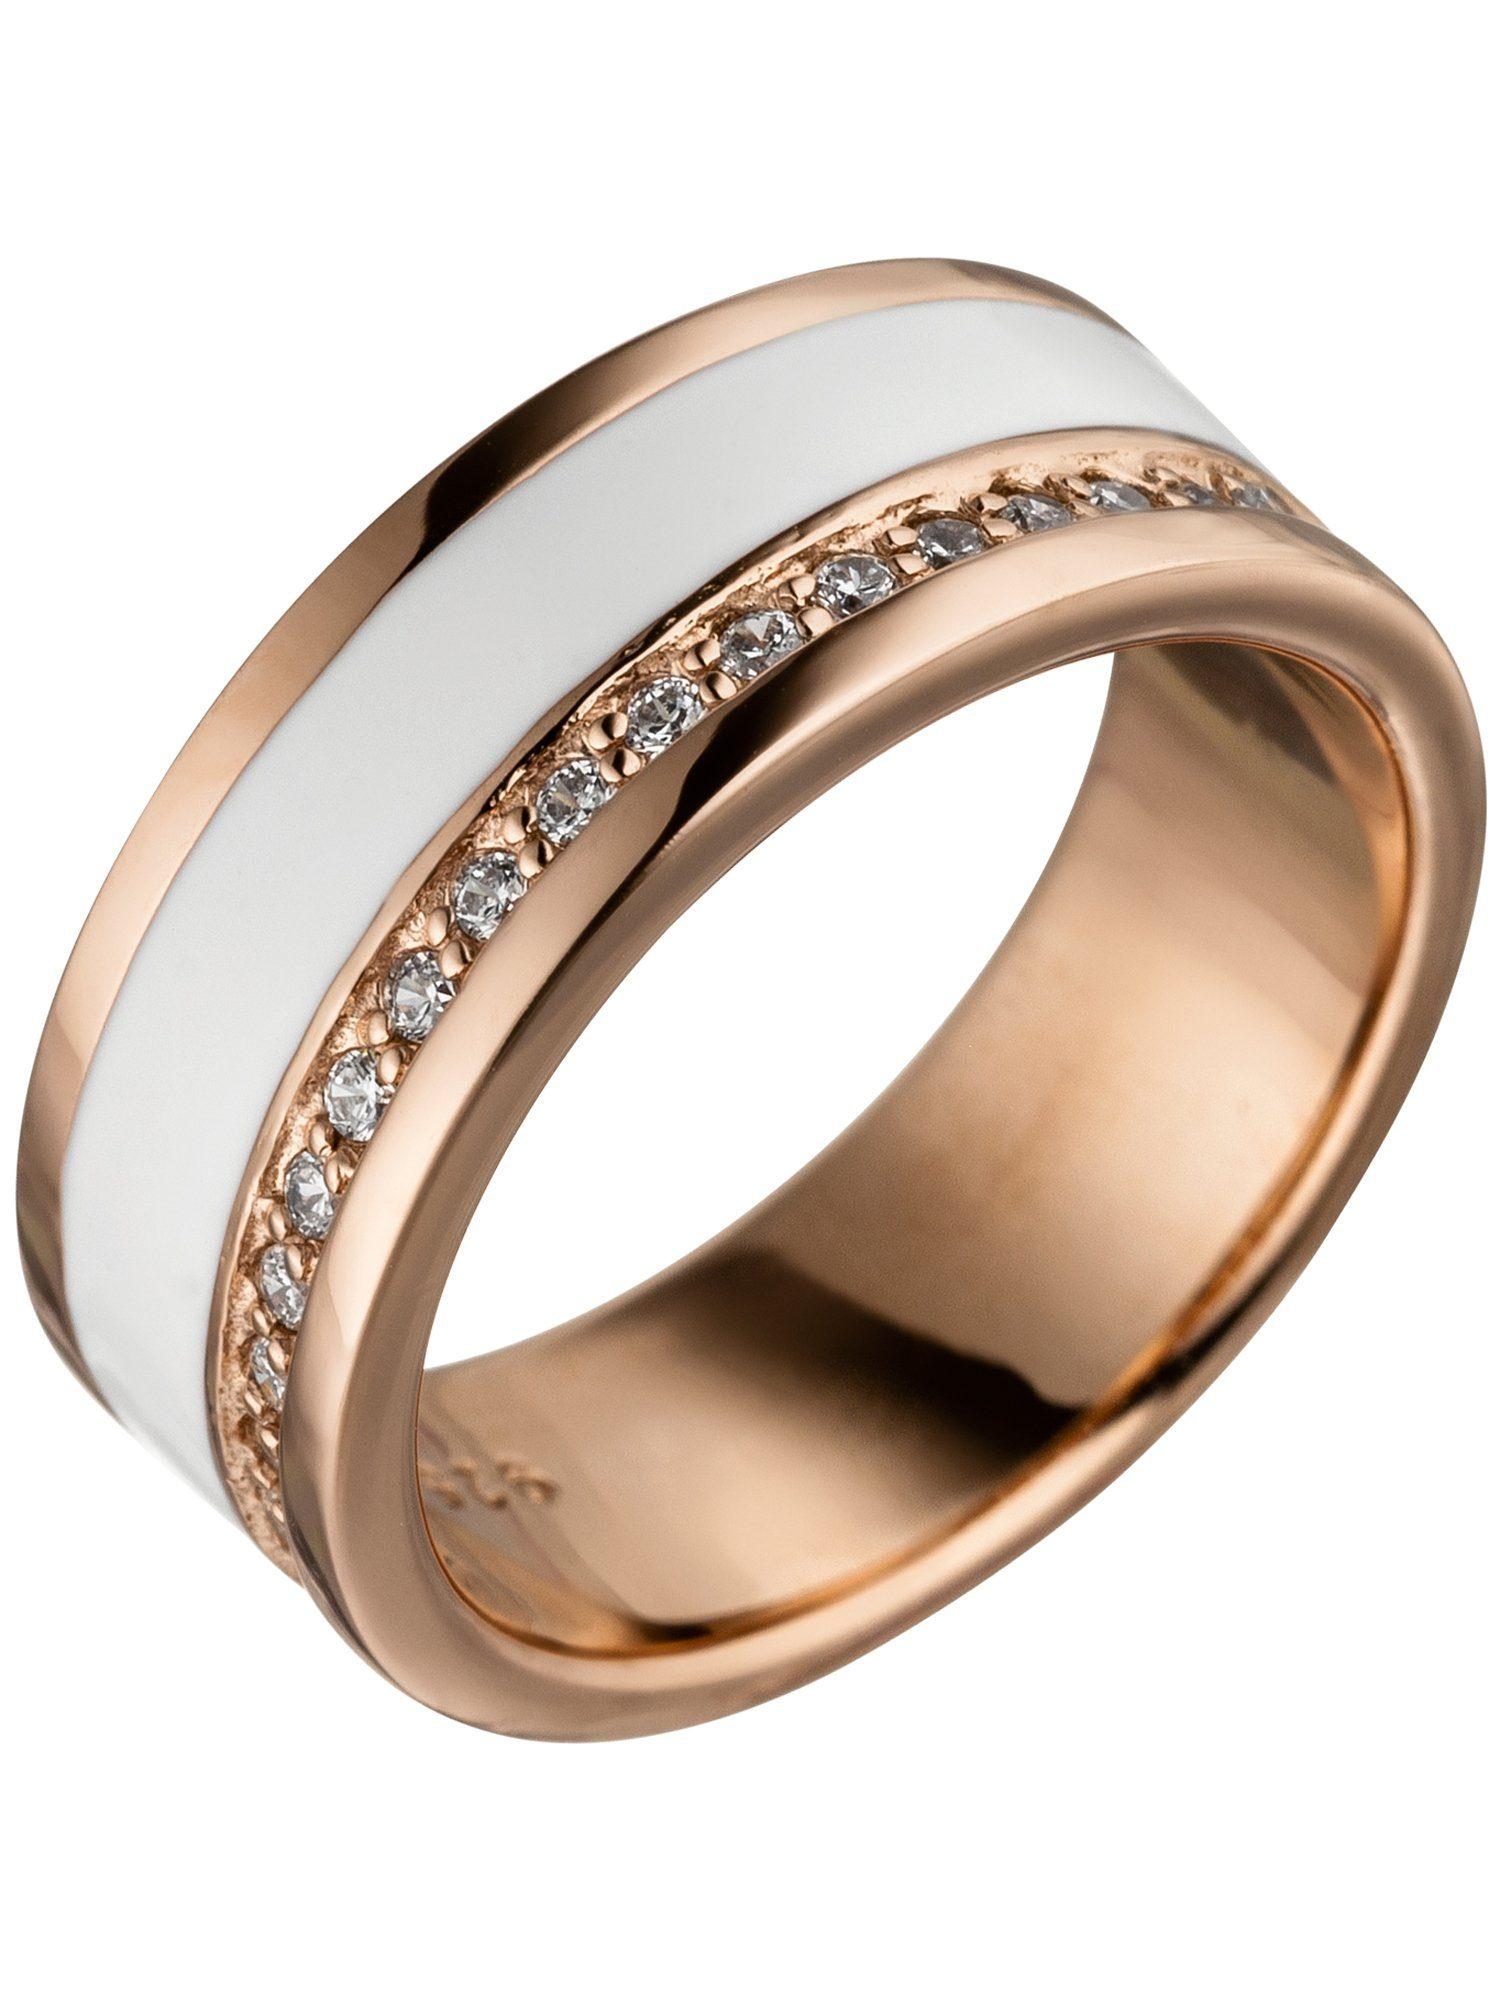 Adelia´s Silberring, 925 Silber mit Zirkonia